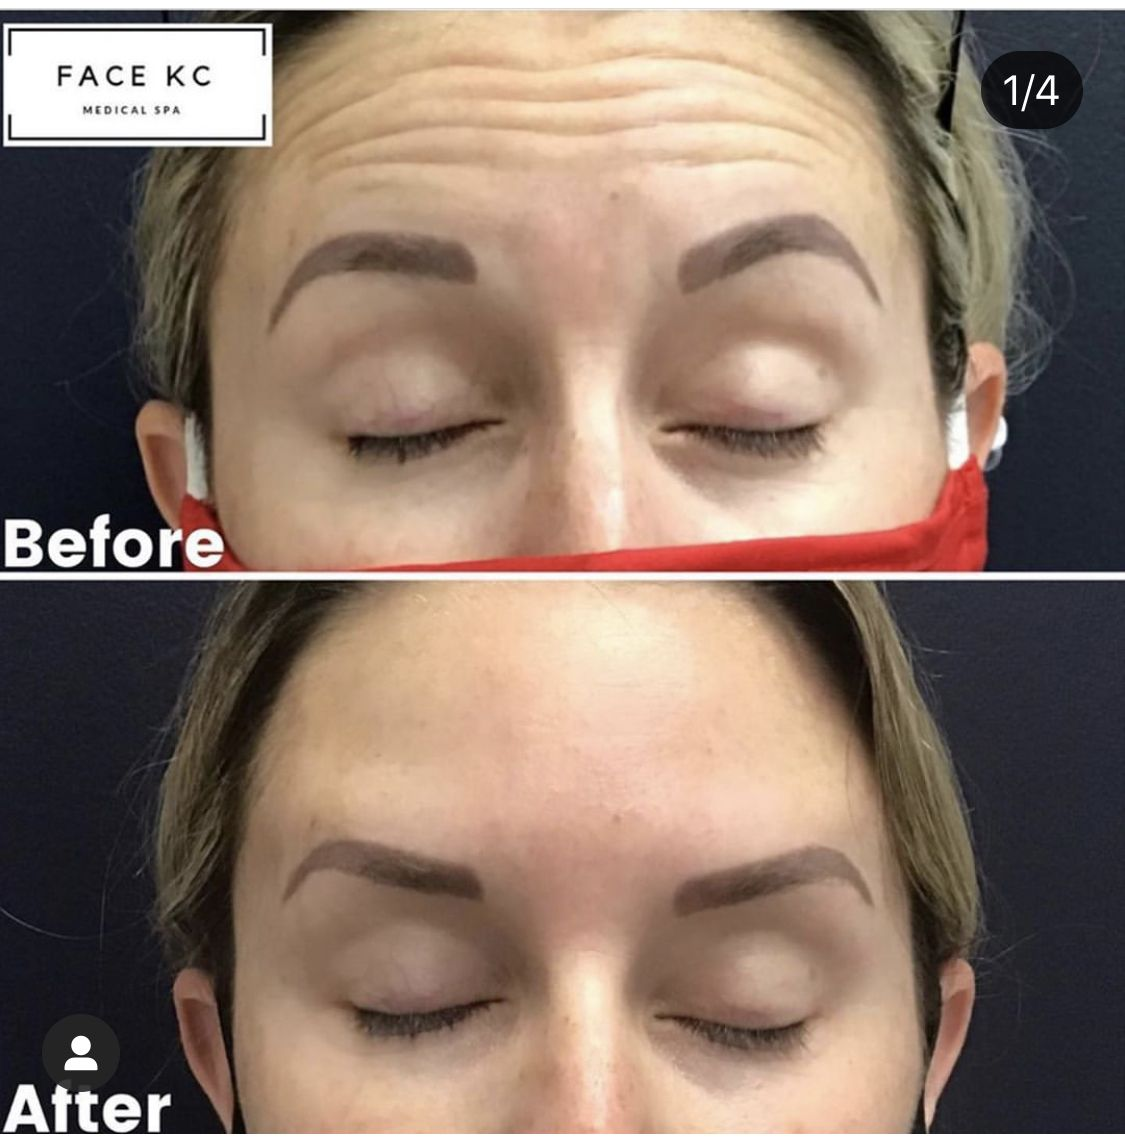 Face Kc Kansas City Medical Spa Medical Spa Skin Benefits Lip Fillers